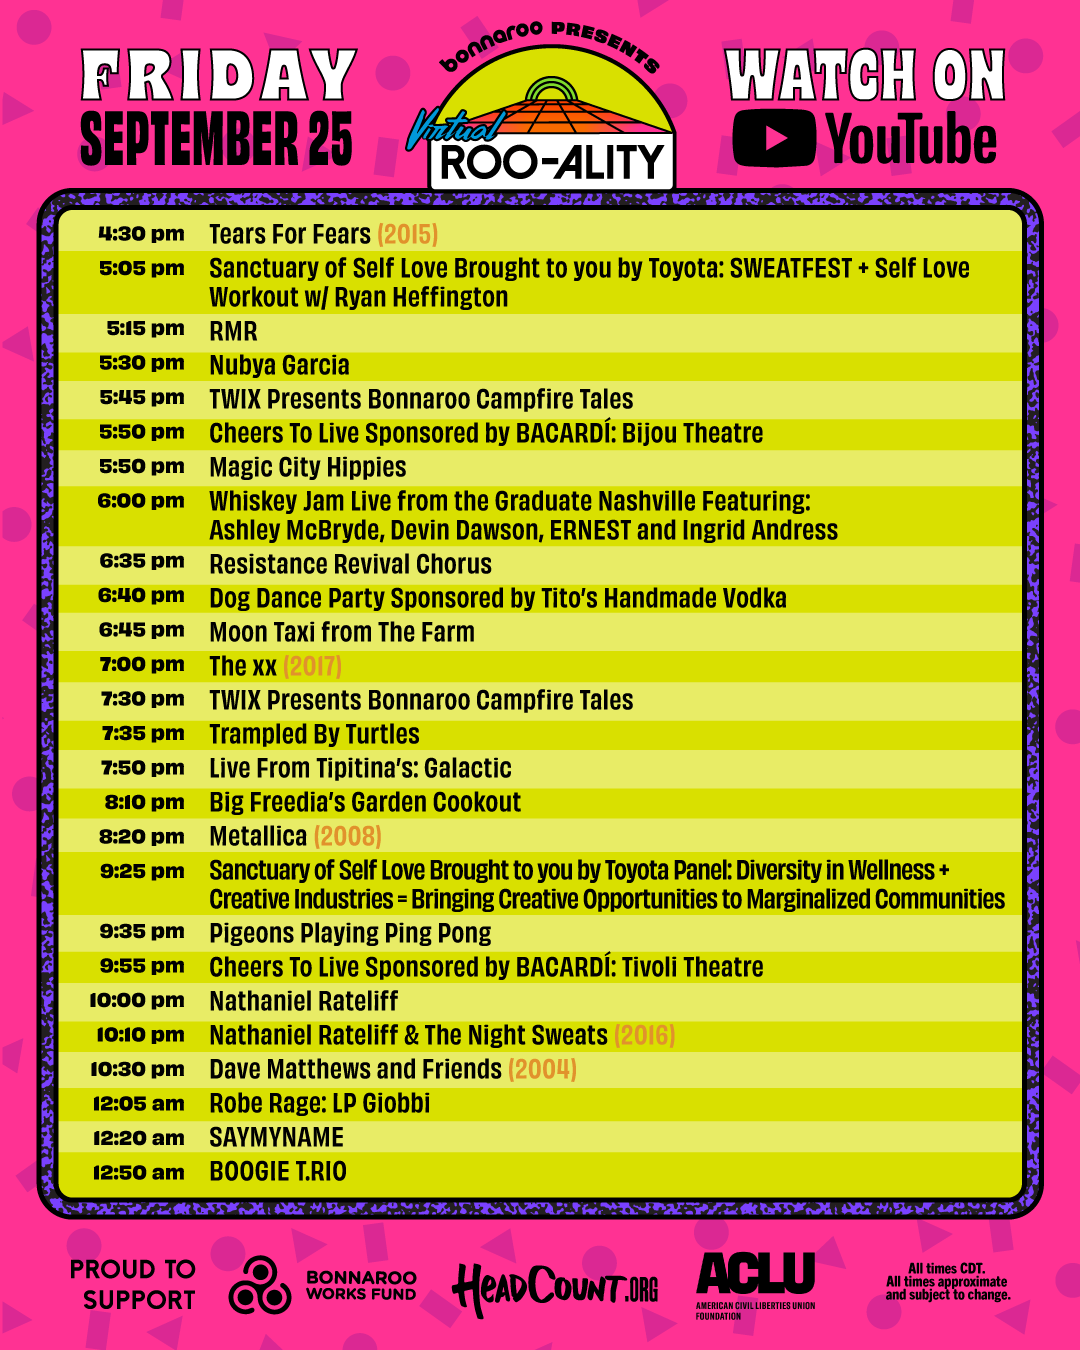 Bonnaroo Friday schedule